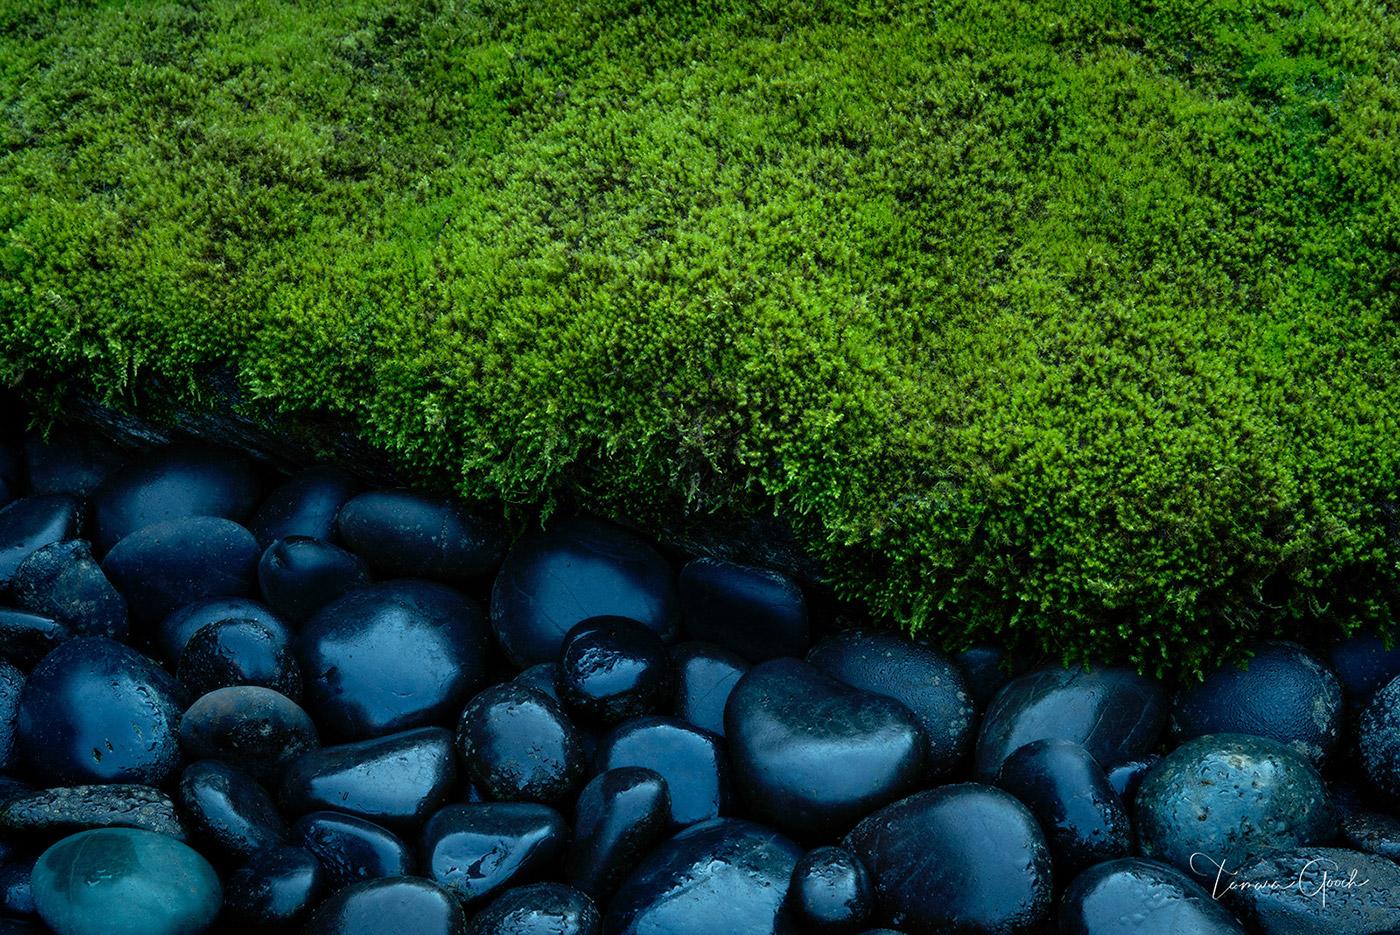 rocks, stones, moss, zen garden, zen, nature, landscape, relax, tranquility, Japenese, Northwest, Pacific Northwest, Oregon, landscape, fine art, art, limited editon, interior design, home decor, deco, photo